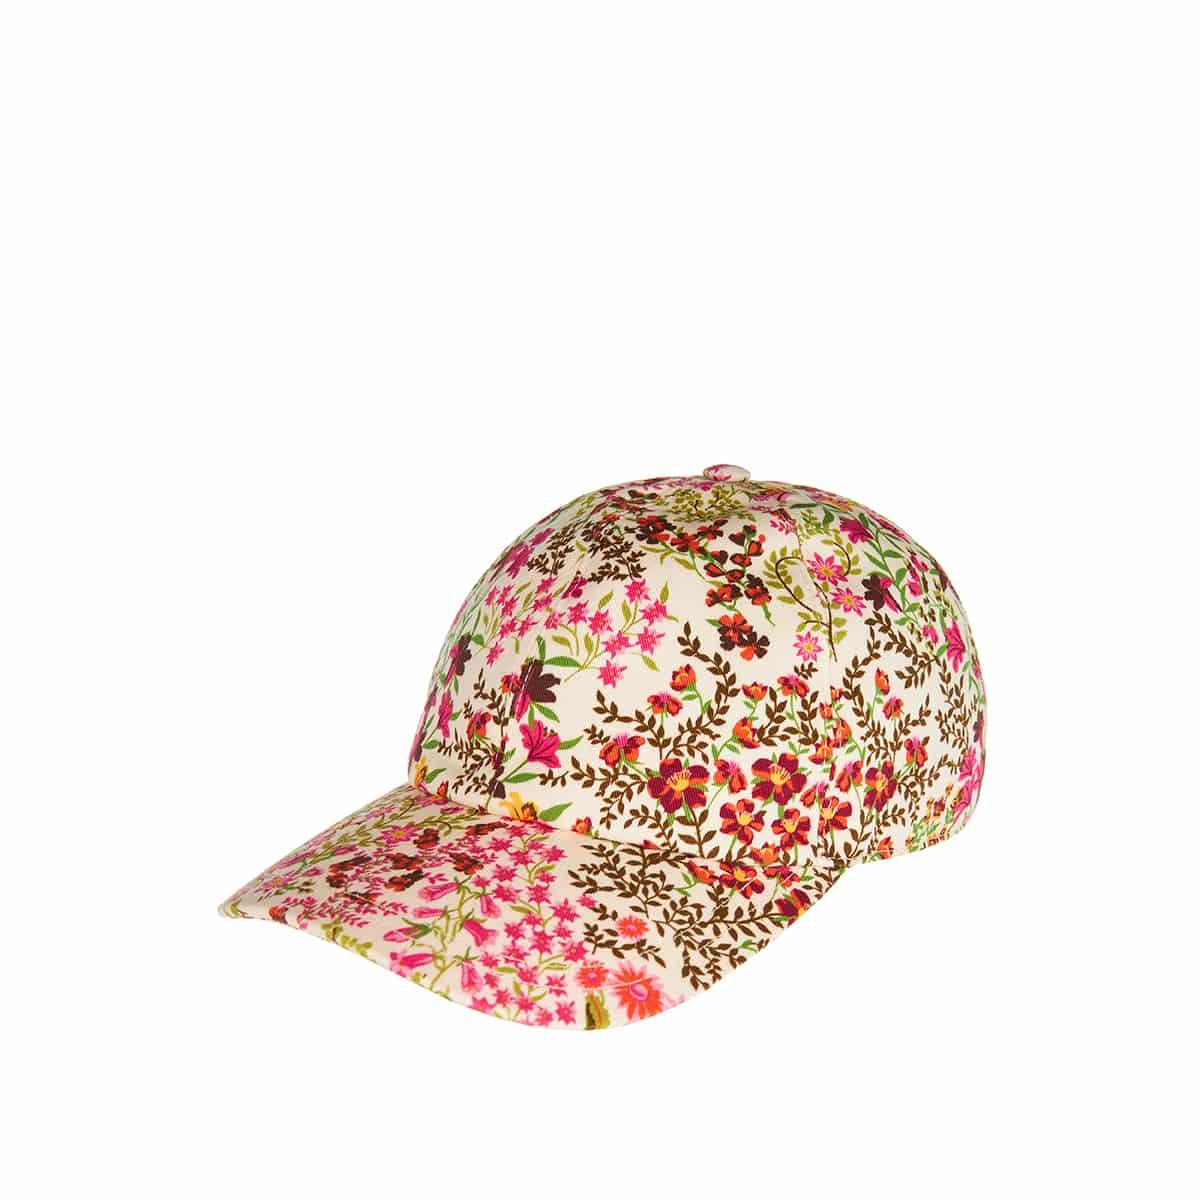 Gucci Eschatology floral cap